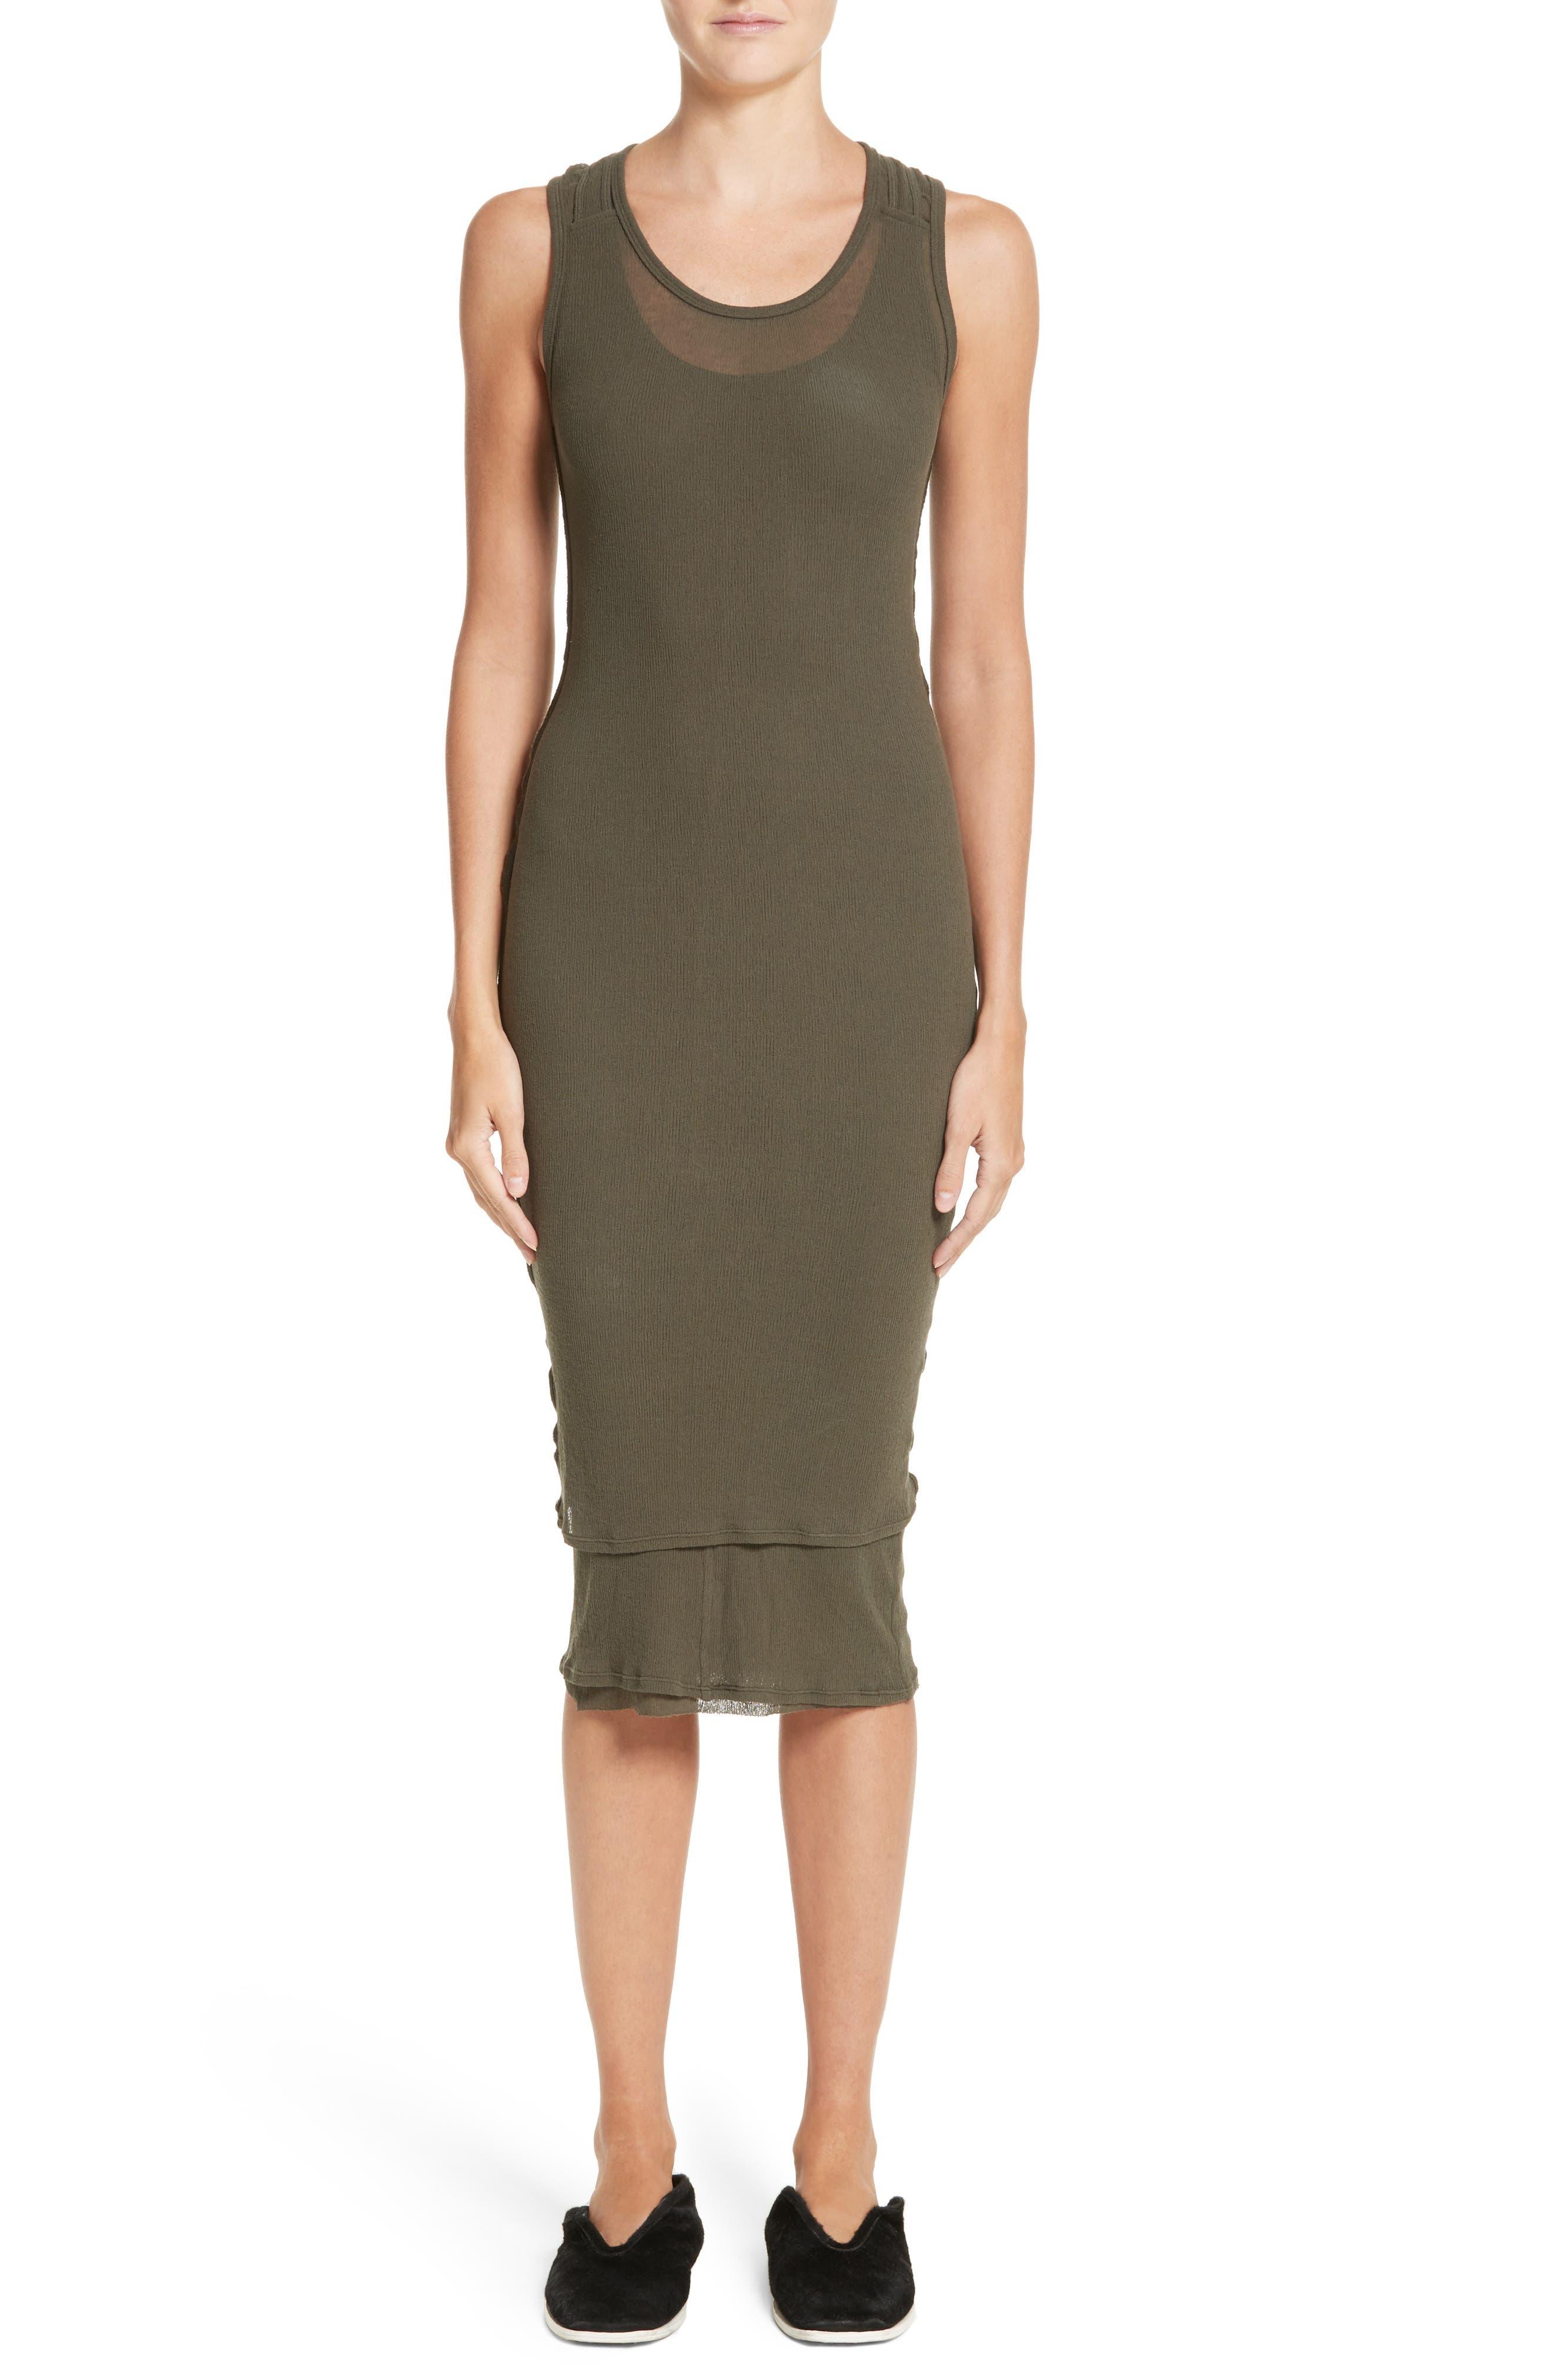 PSWL Jersey Gauze Dress,                             Main thumbnail 1, color,                             Army